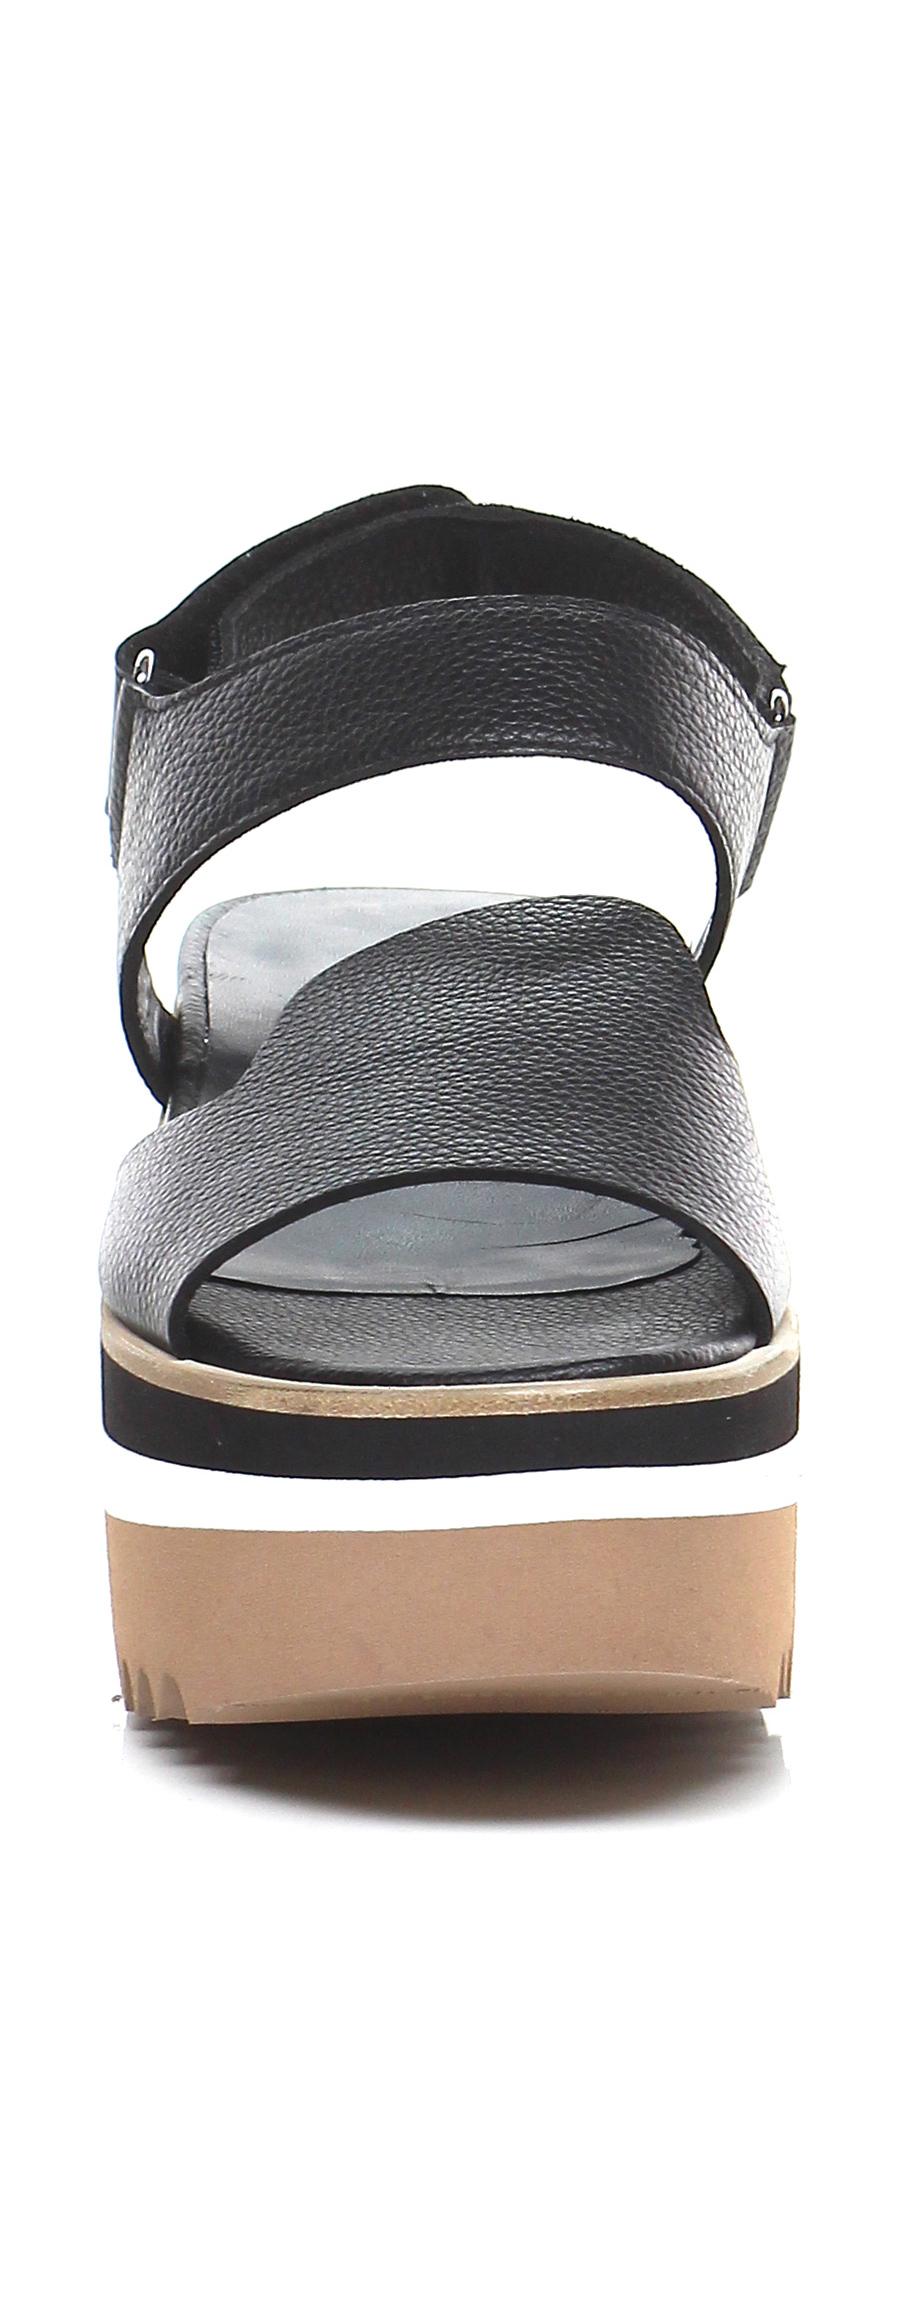 Zeppa Nero Laura Mode Bellariva Mode Laura billige Schuhe 21f714